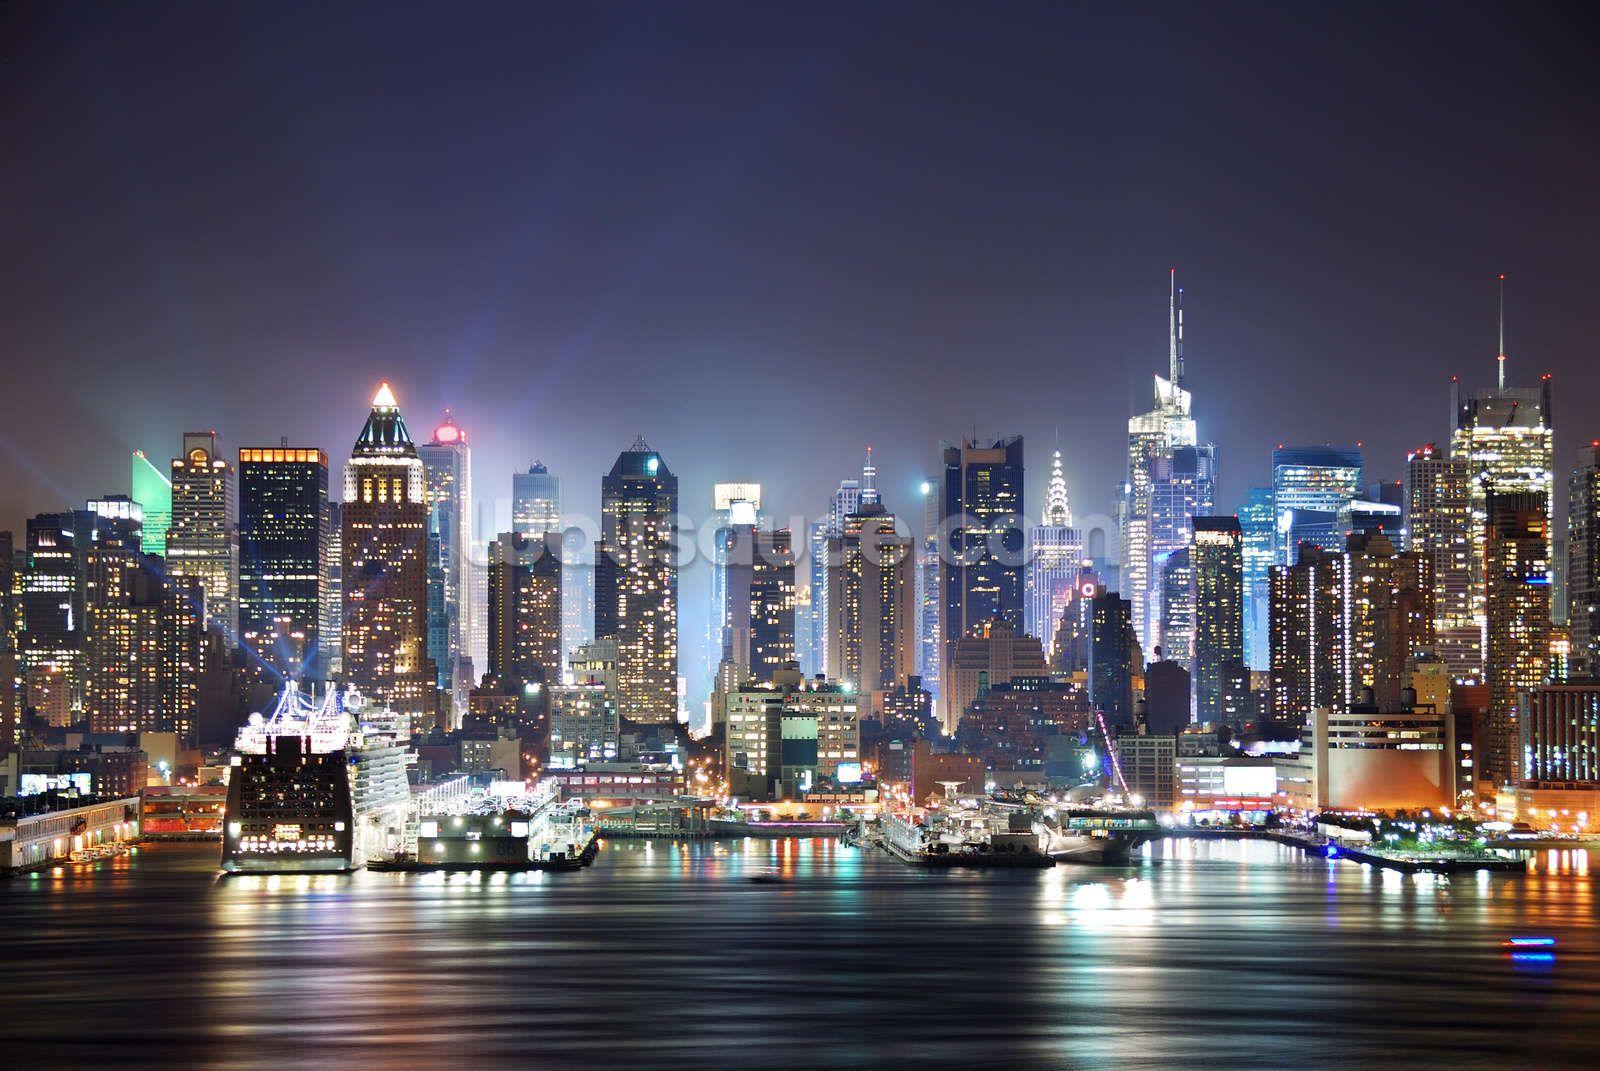 New York Manhattan Skyline At Night - HD Wallpaper